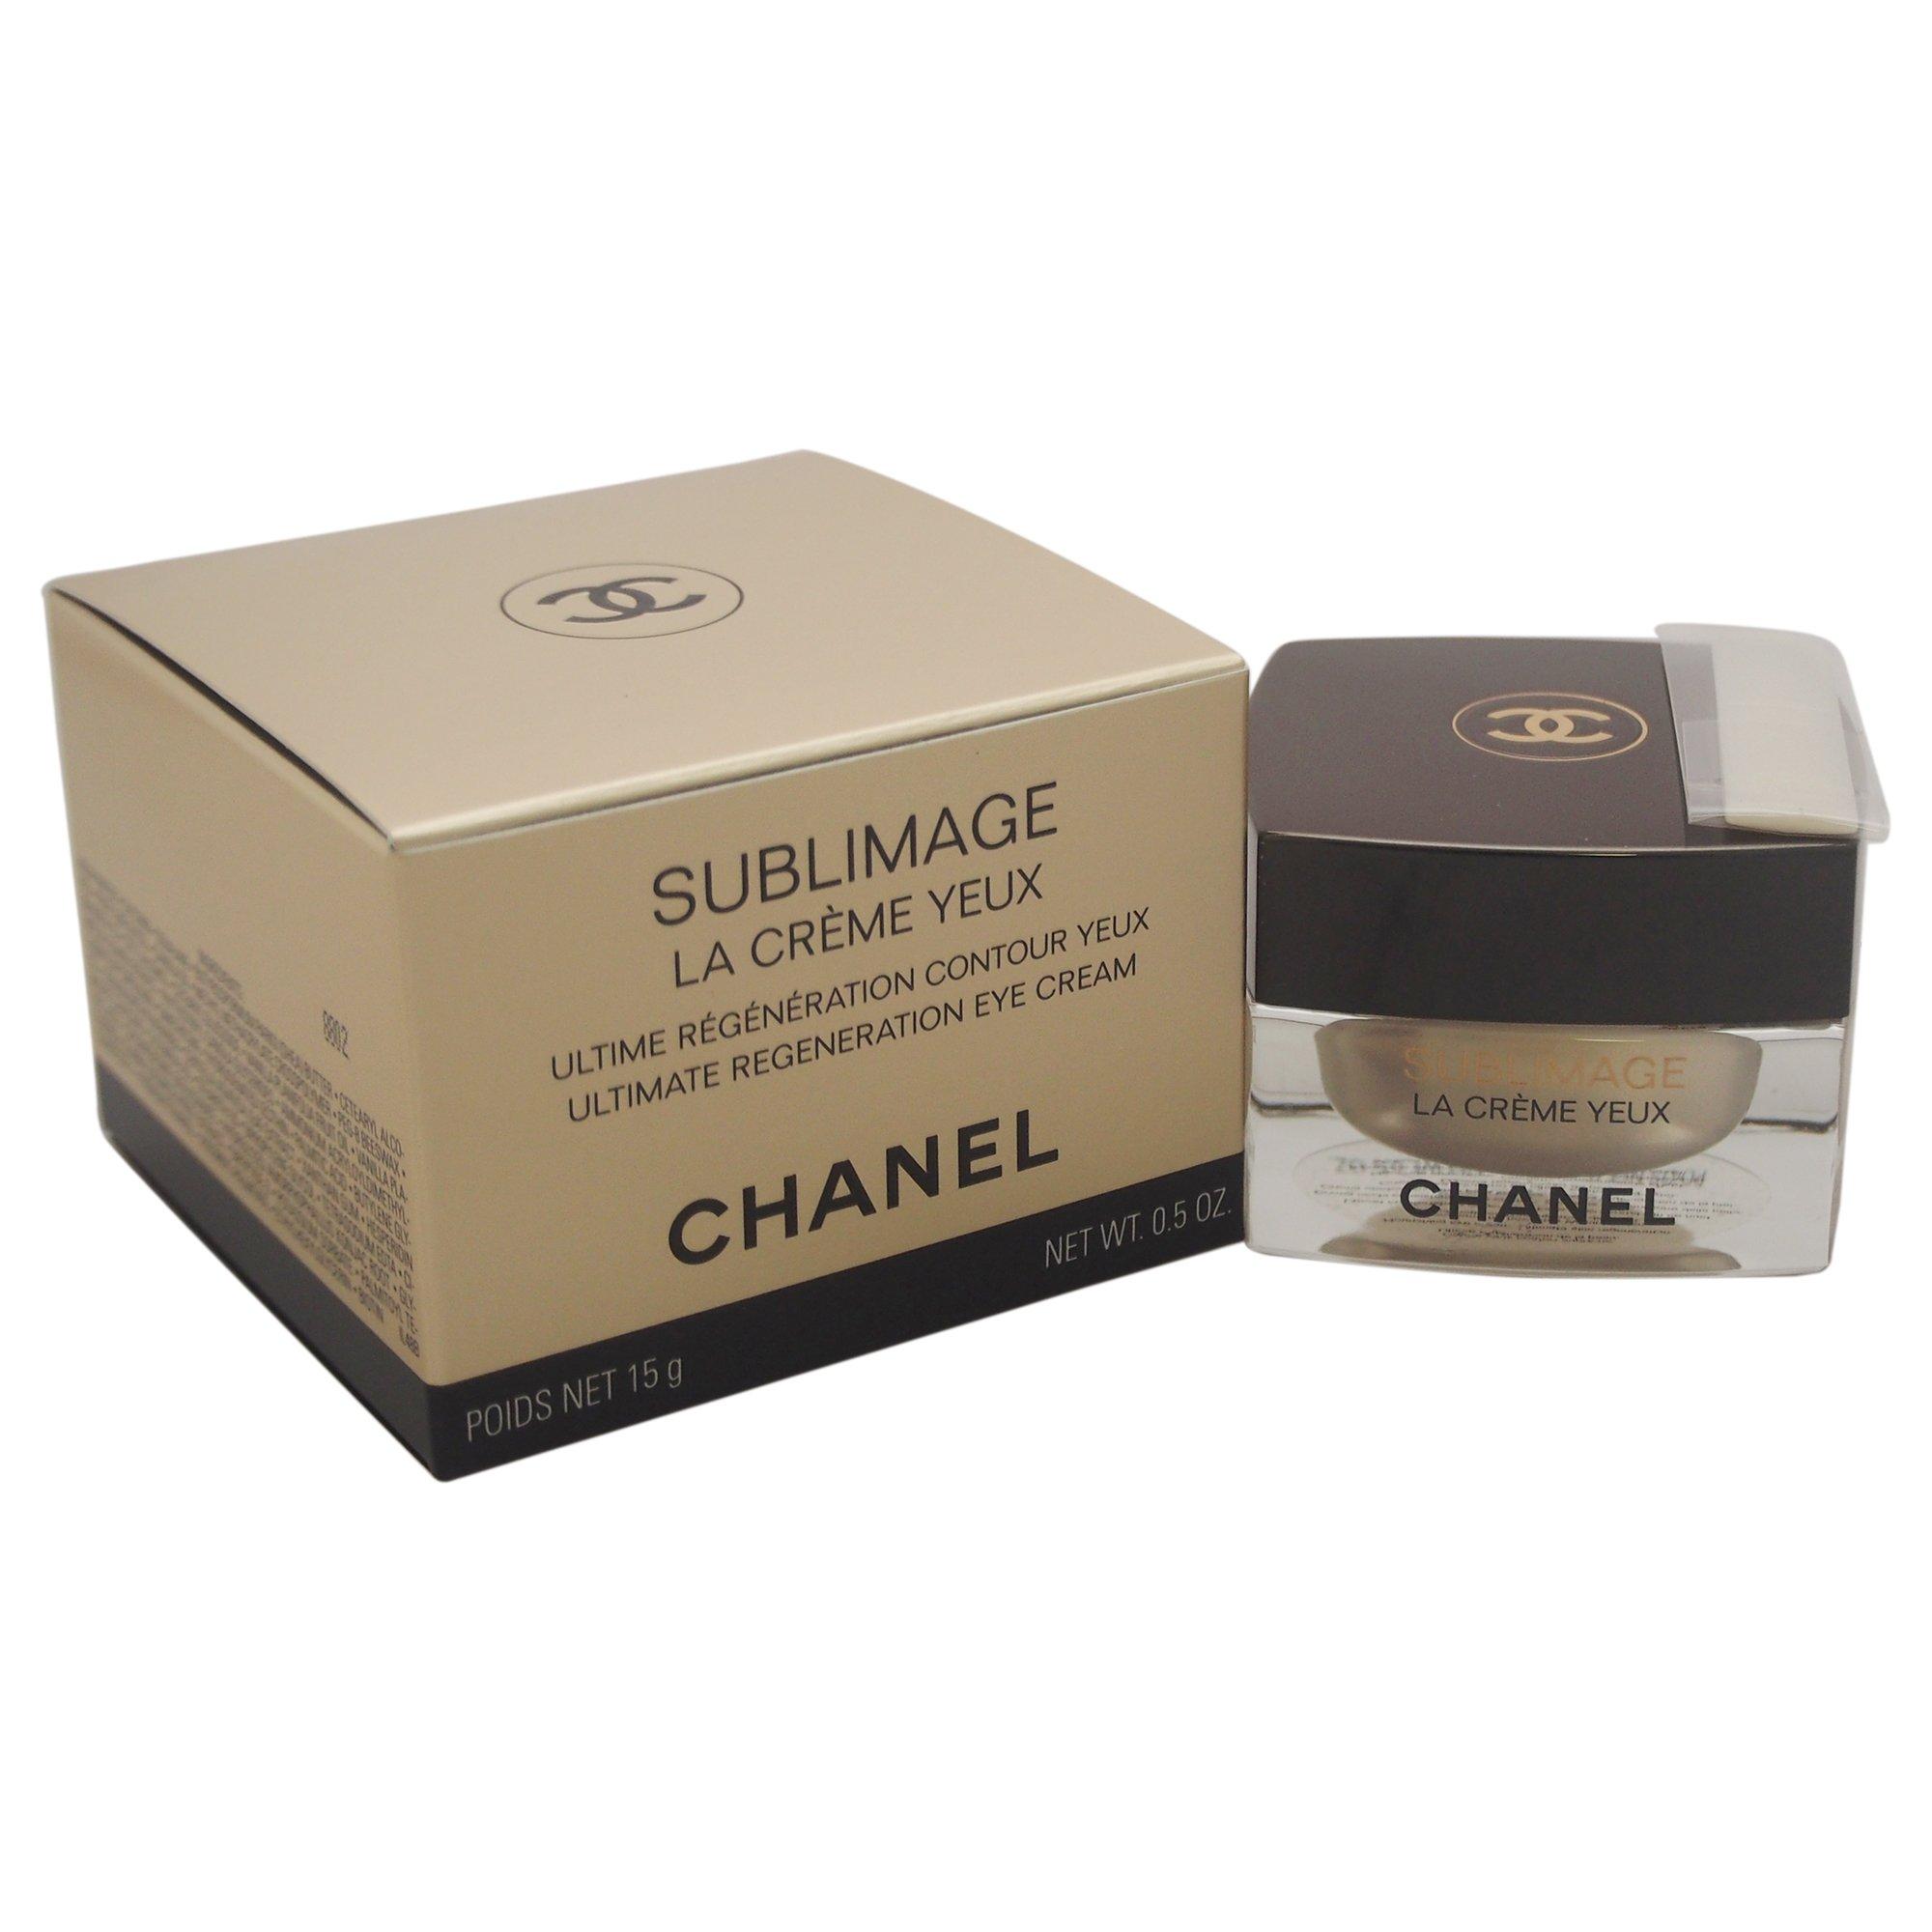 Chanel Sublimage La Creme Yeux Ultimate Regeneration Eye Cream, 0.5 Ounce